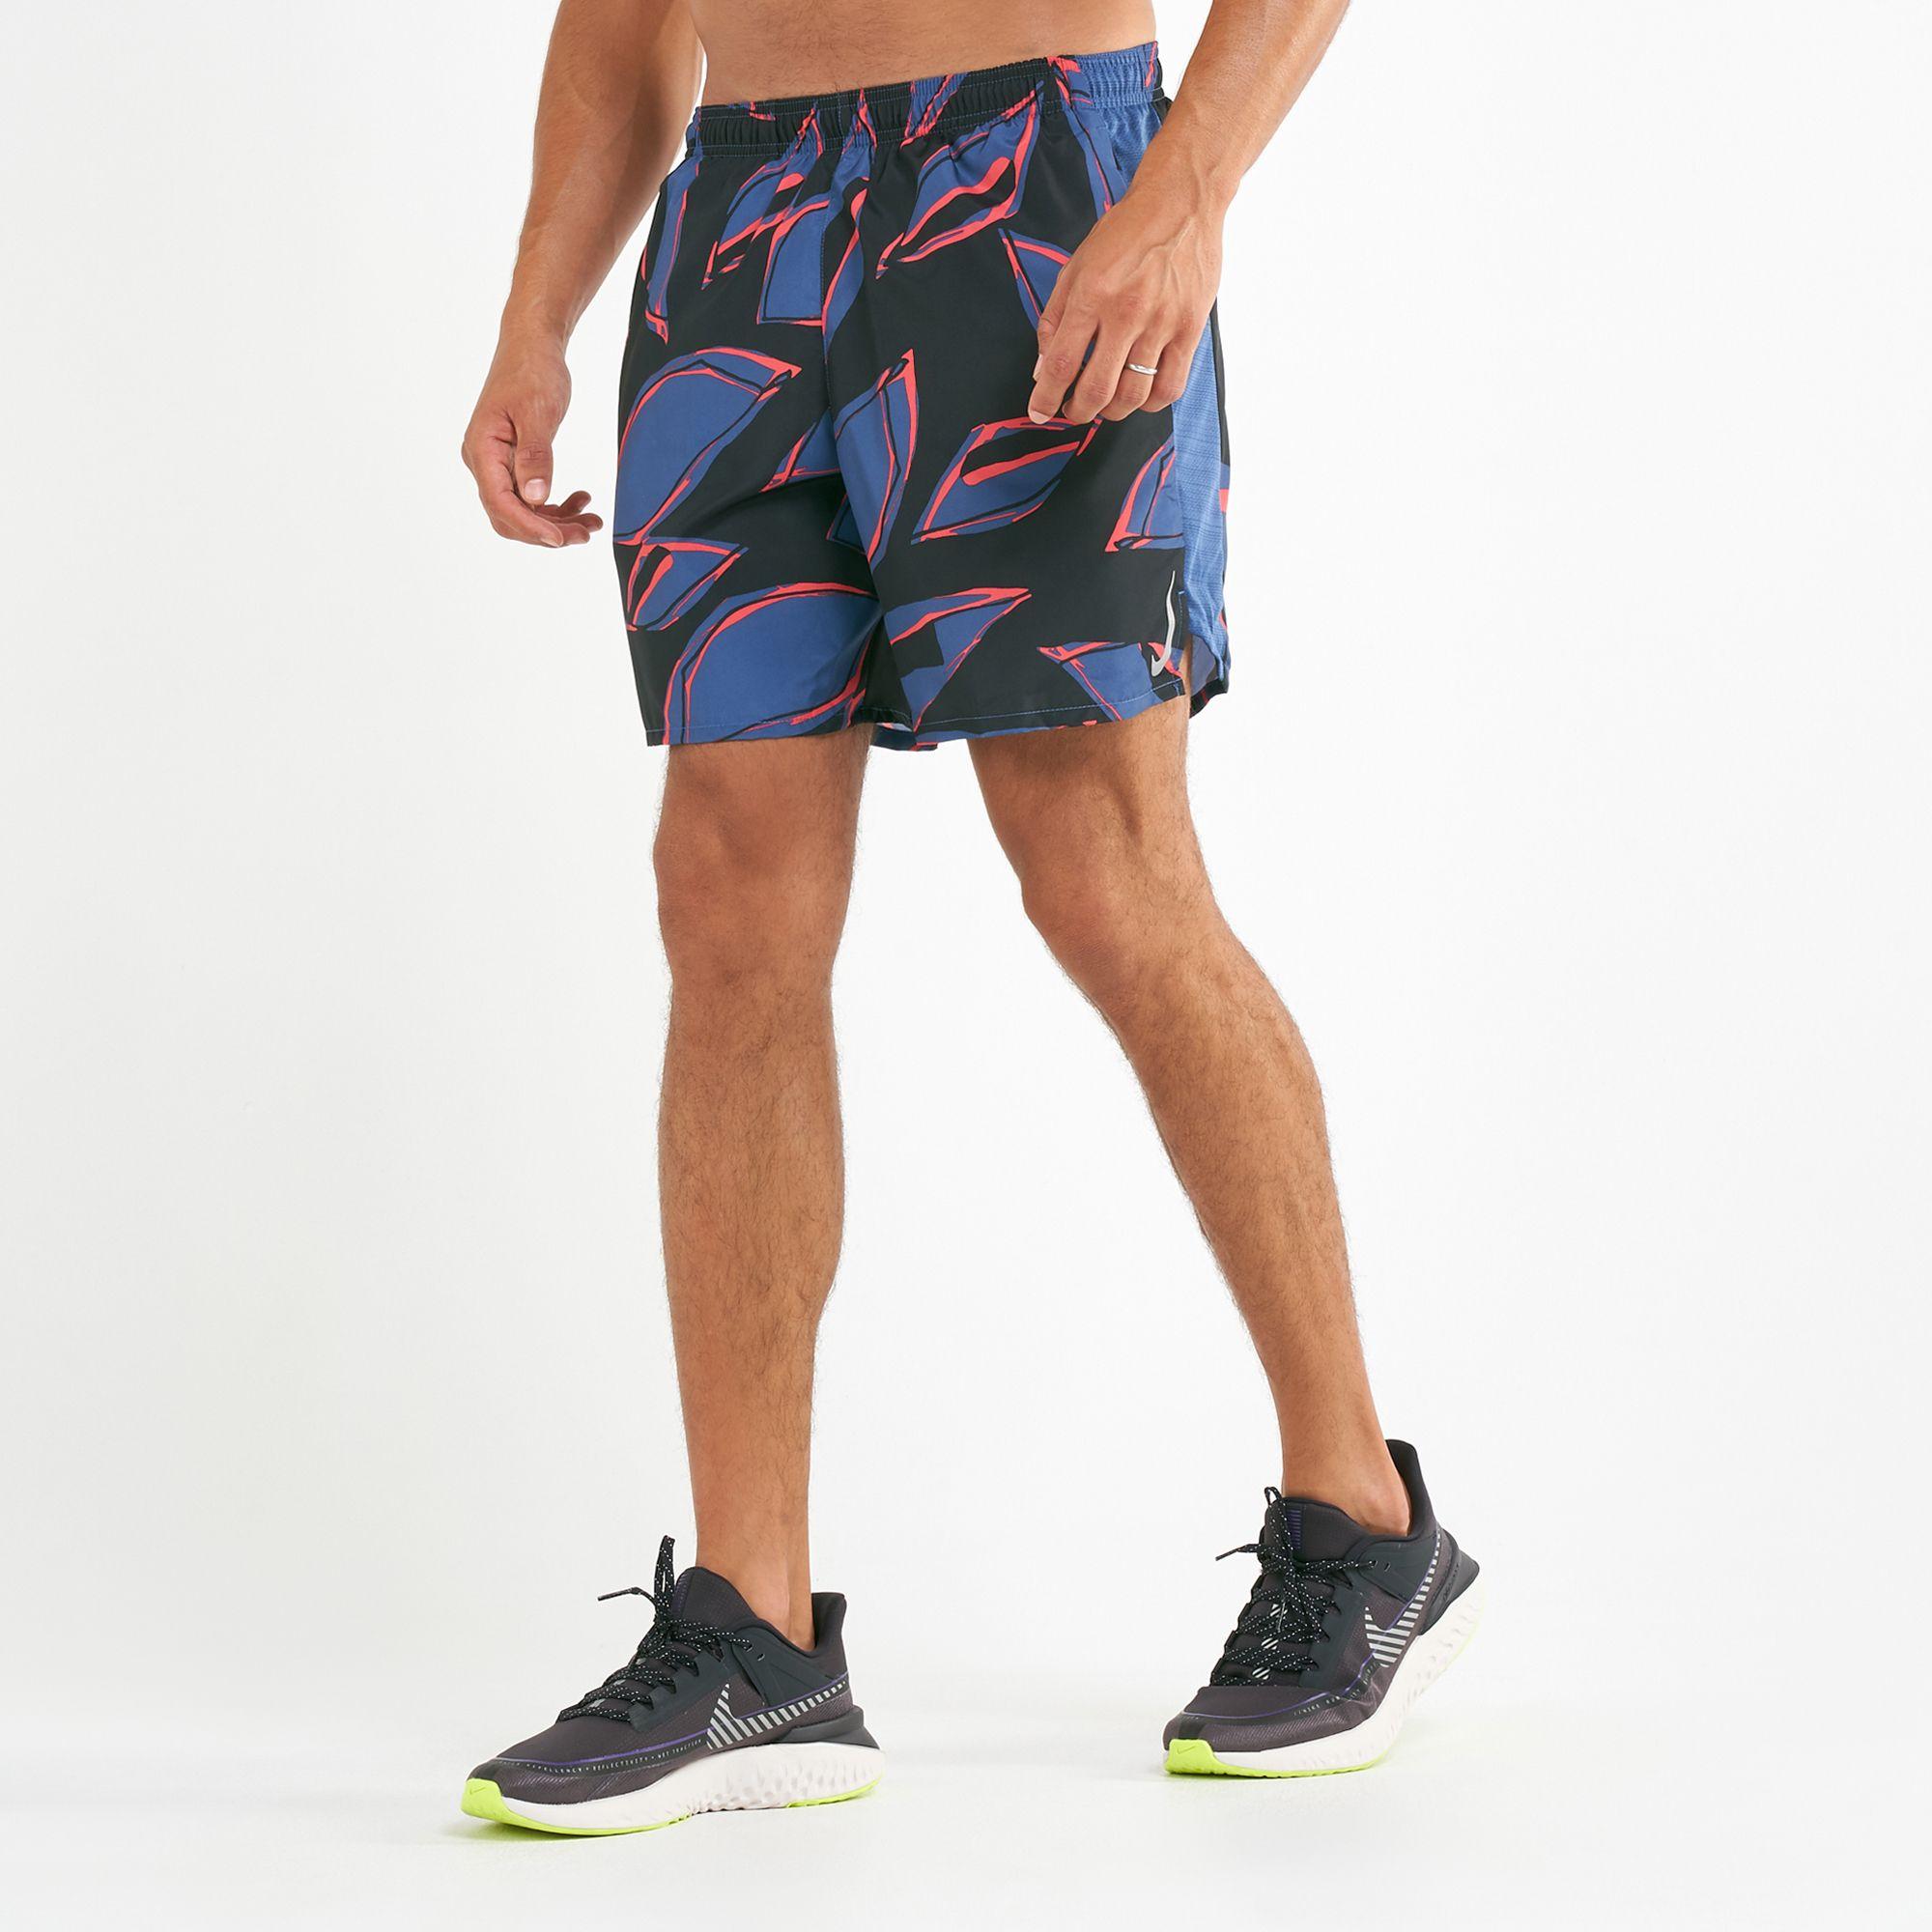 "Nike CHALLENGER MEN/'S 5"" RUNNING SHORTS Waistband,BLACK- Size S L XL Or 2XL M"